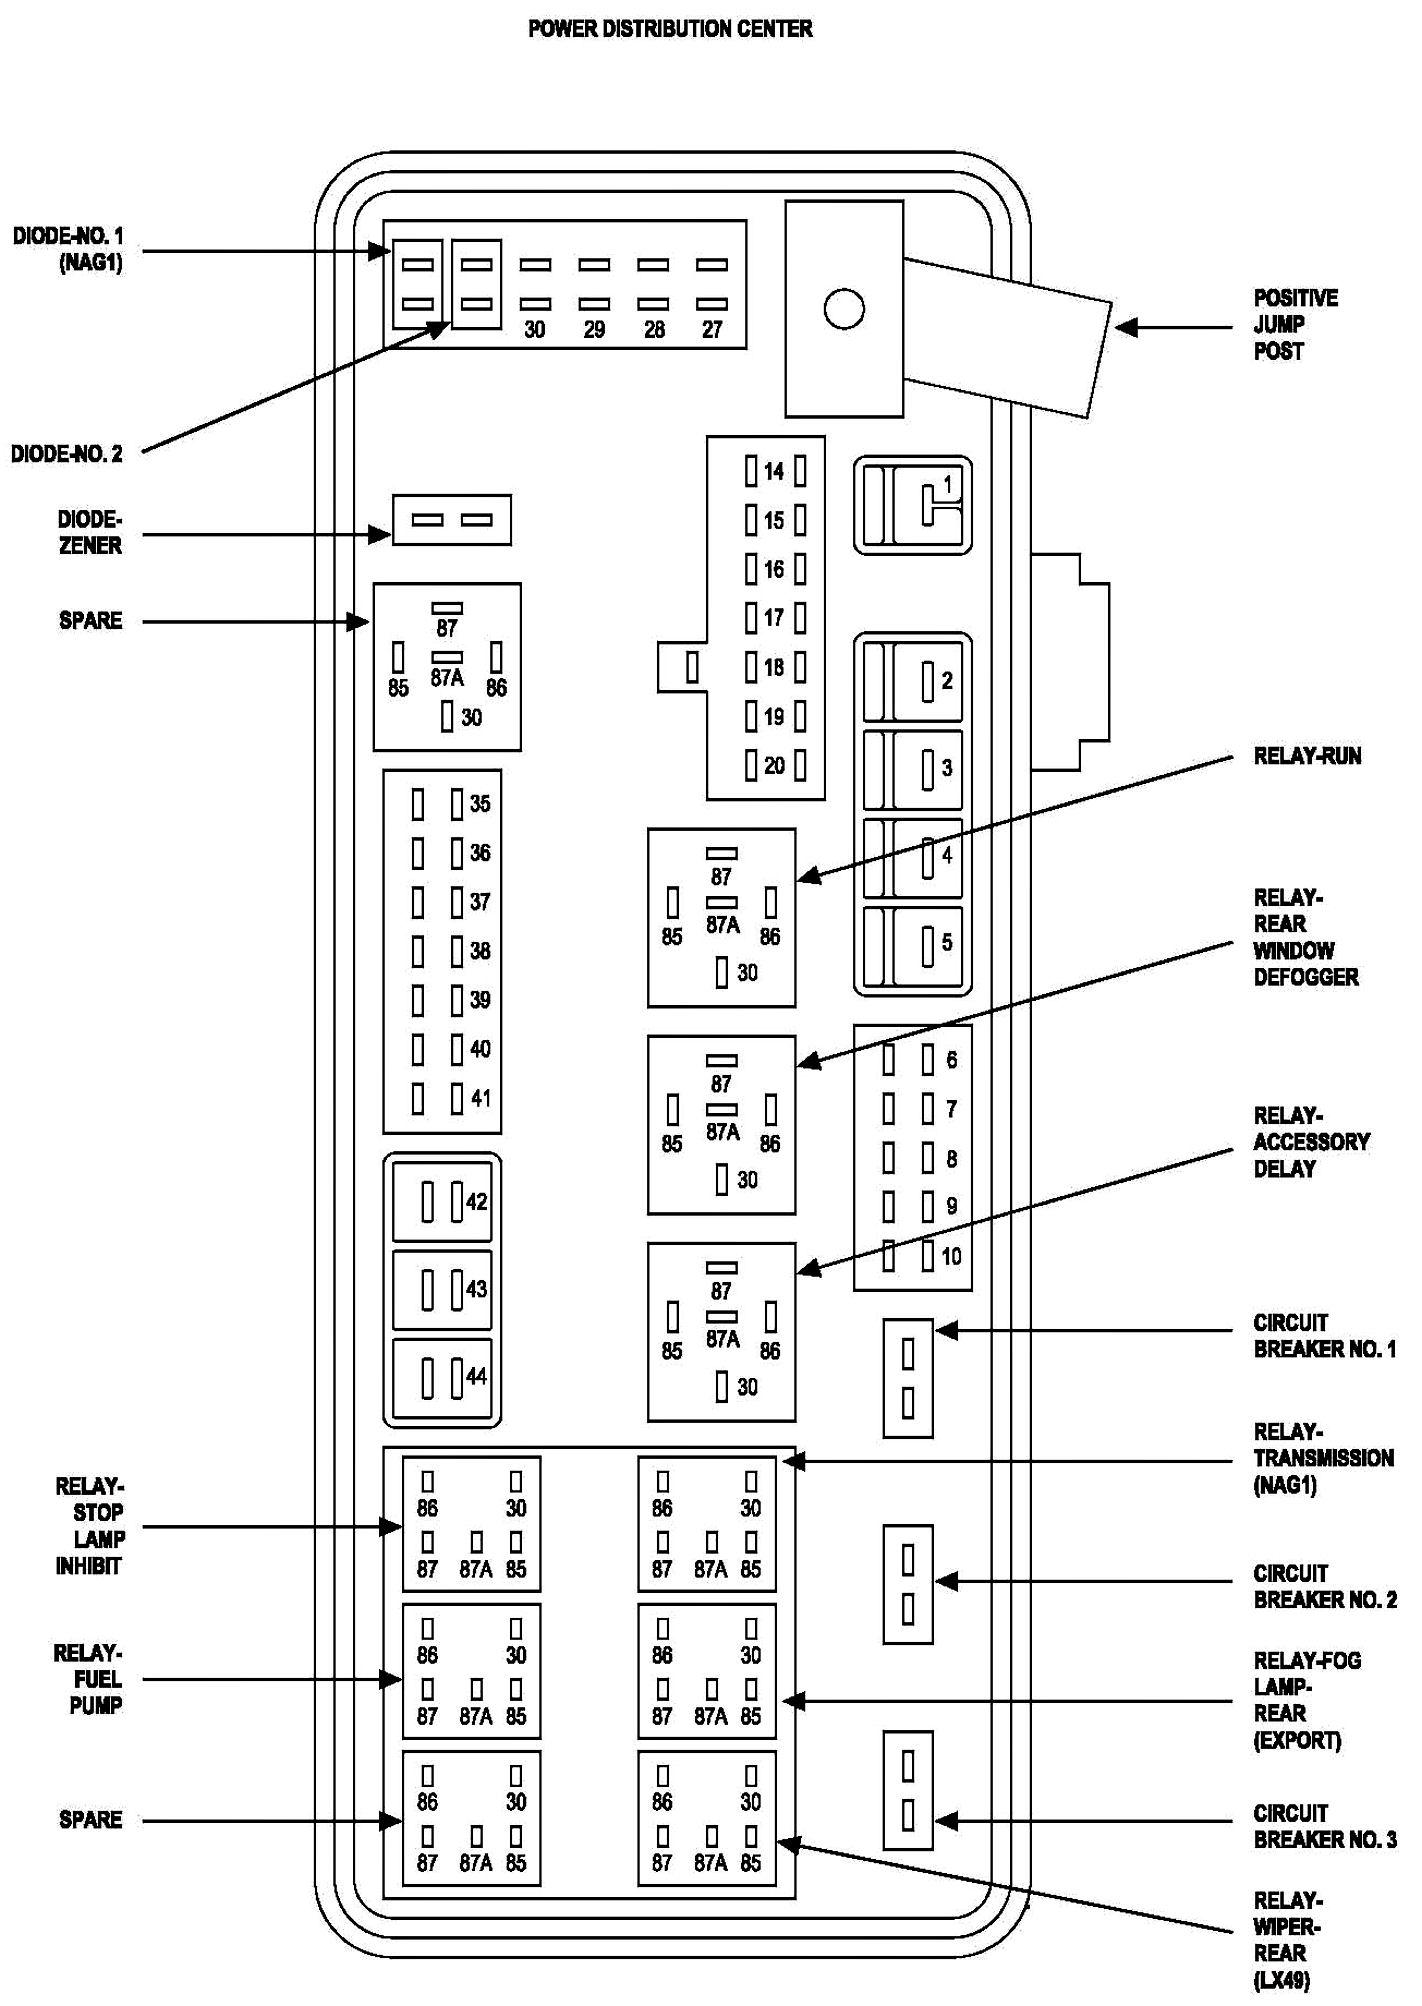 Diagram Of Chrysler 300 Touring Fuse Box In Trunk 2007 -Wiring Diagram For  2000 Toyota Corolla   Begeboy Wiring Diagram SourceBegeboy Wiring Diagram Source